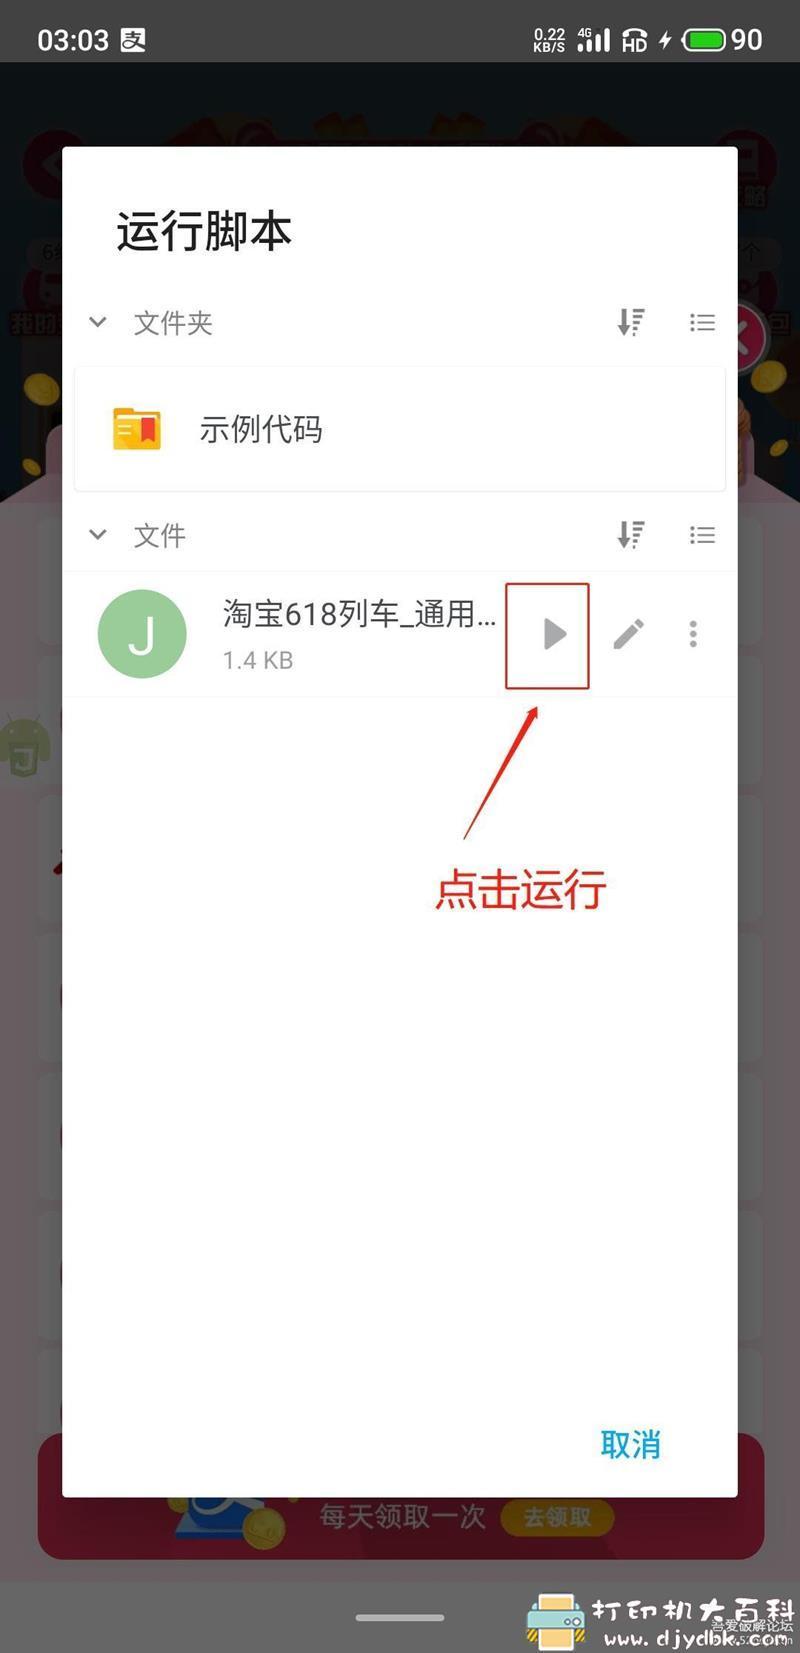 [Android]淘宝618列车活动 自动浏览任务 Auto.js脚本图片 No.4